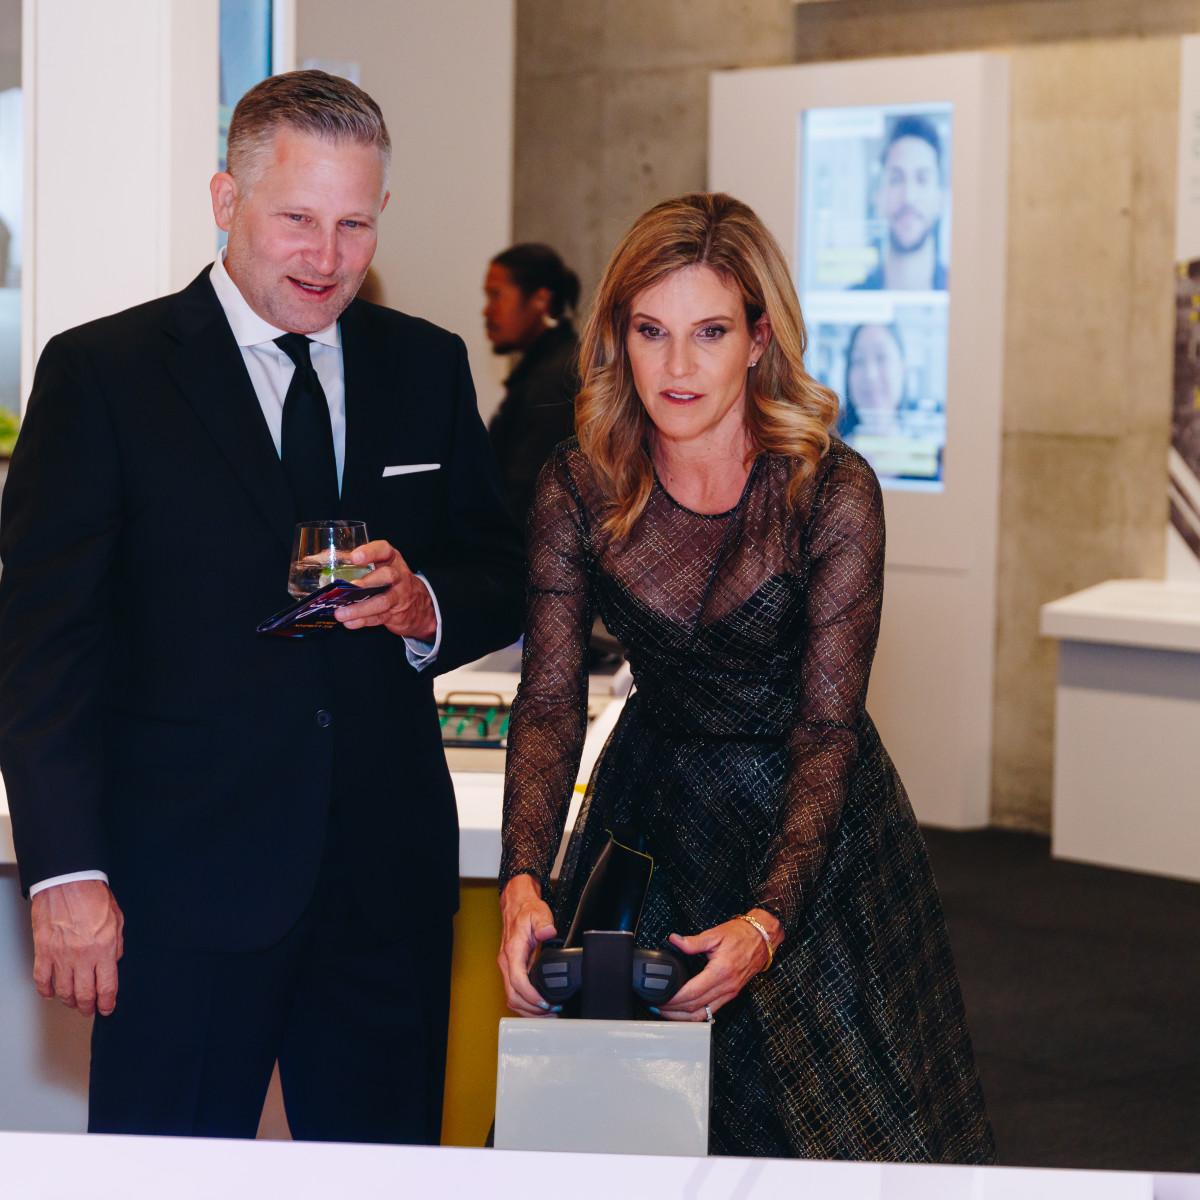 Rob and Jill VanGorden